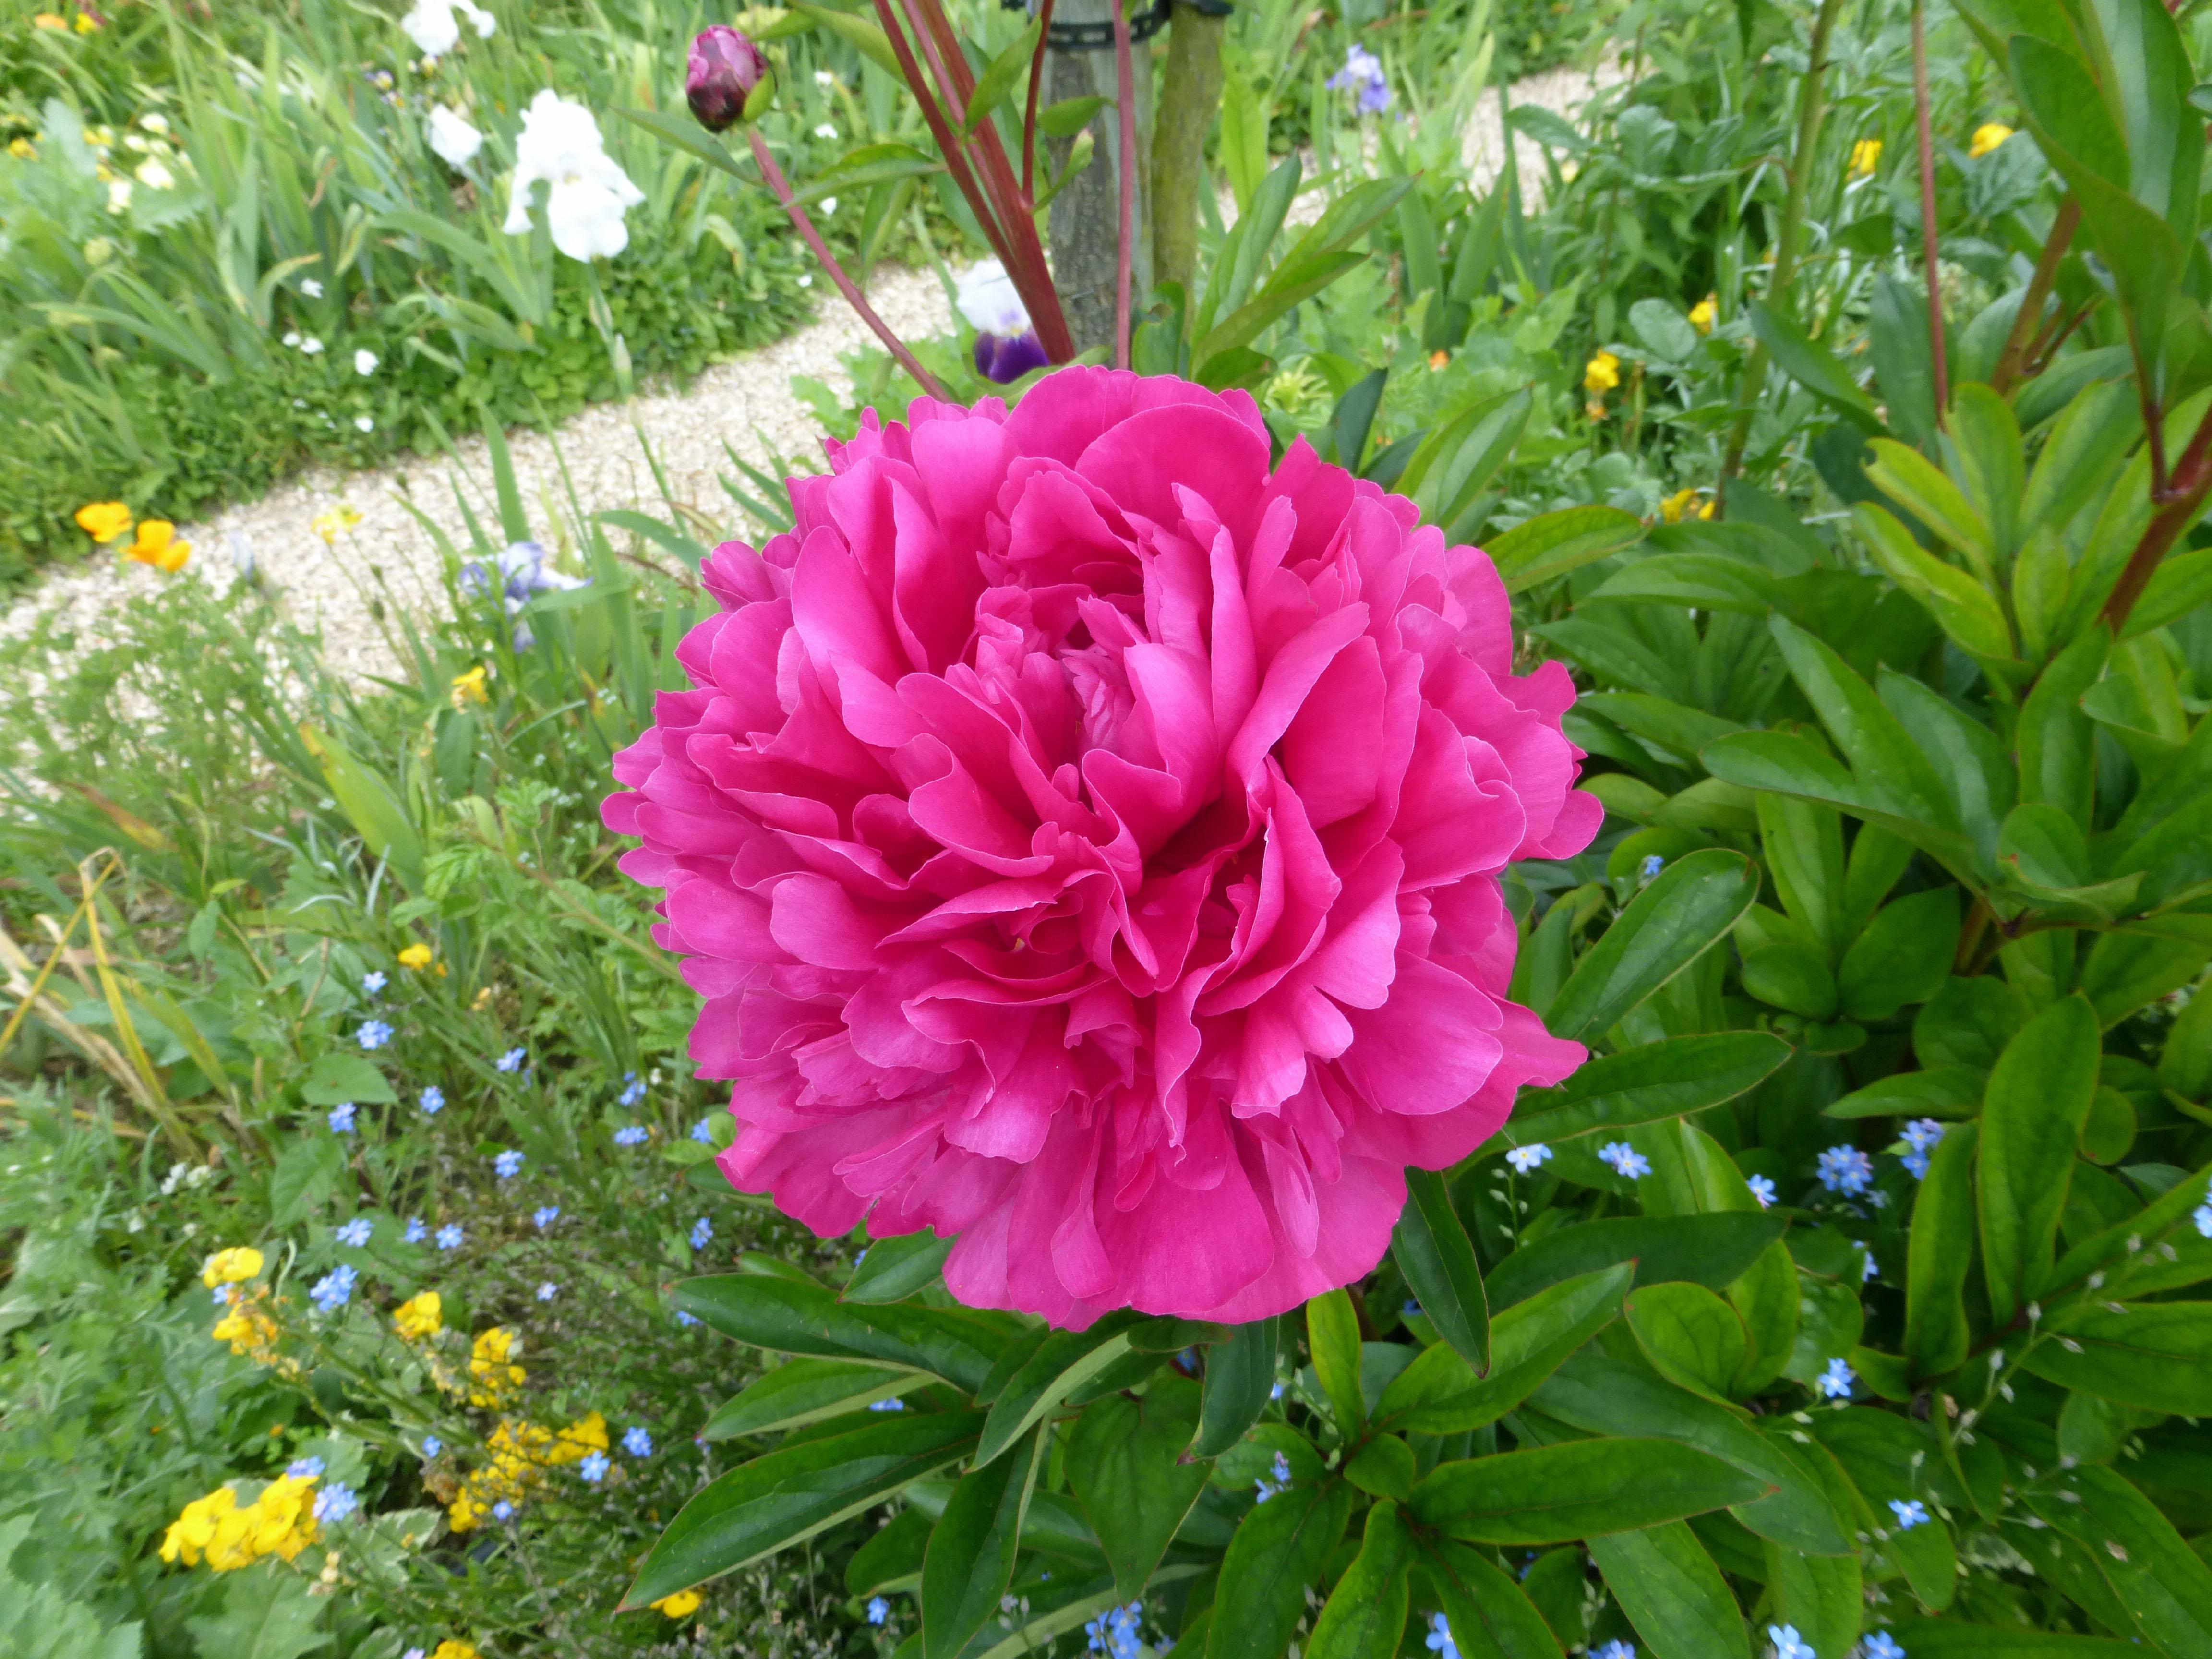 bright pink peonie